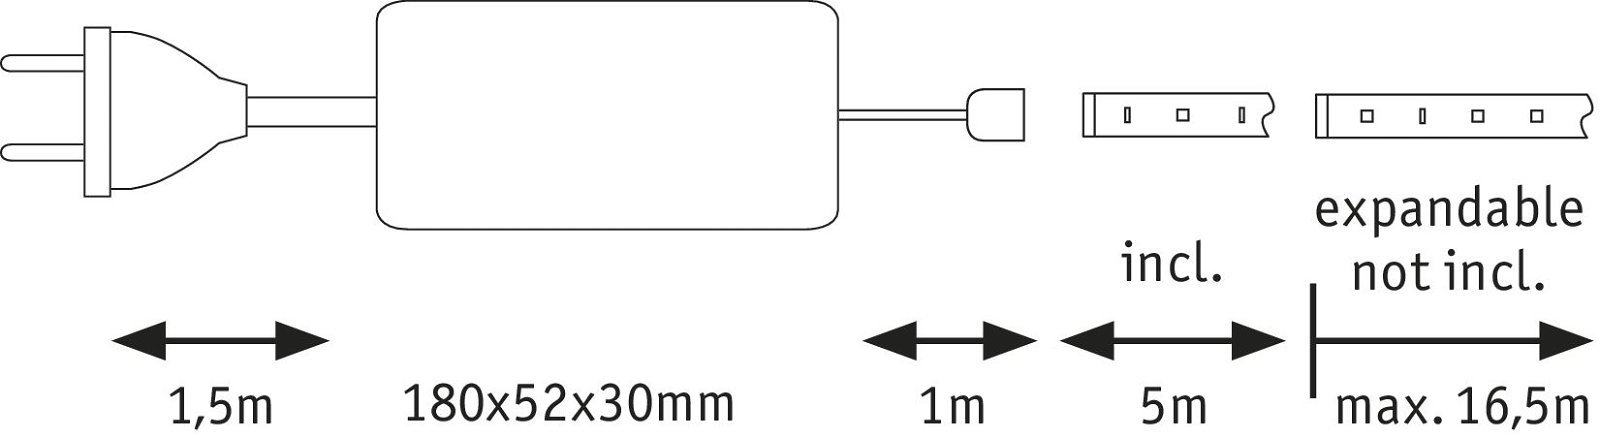 MaxLED 500 Strip LED Blanc chaud 5m 33W 550lm/m 2700K 75VA